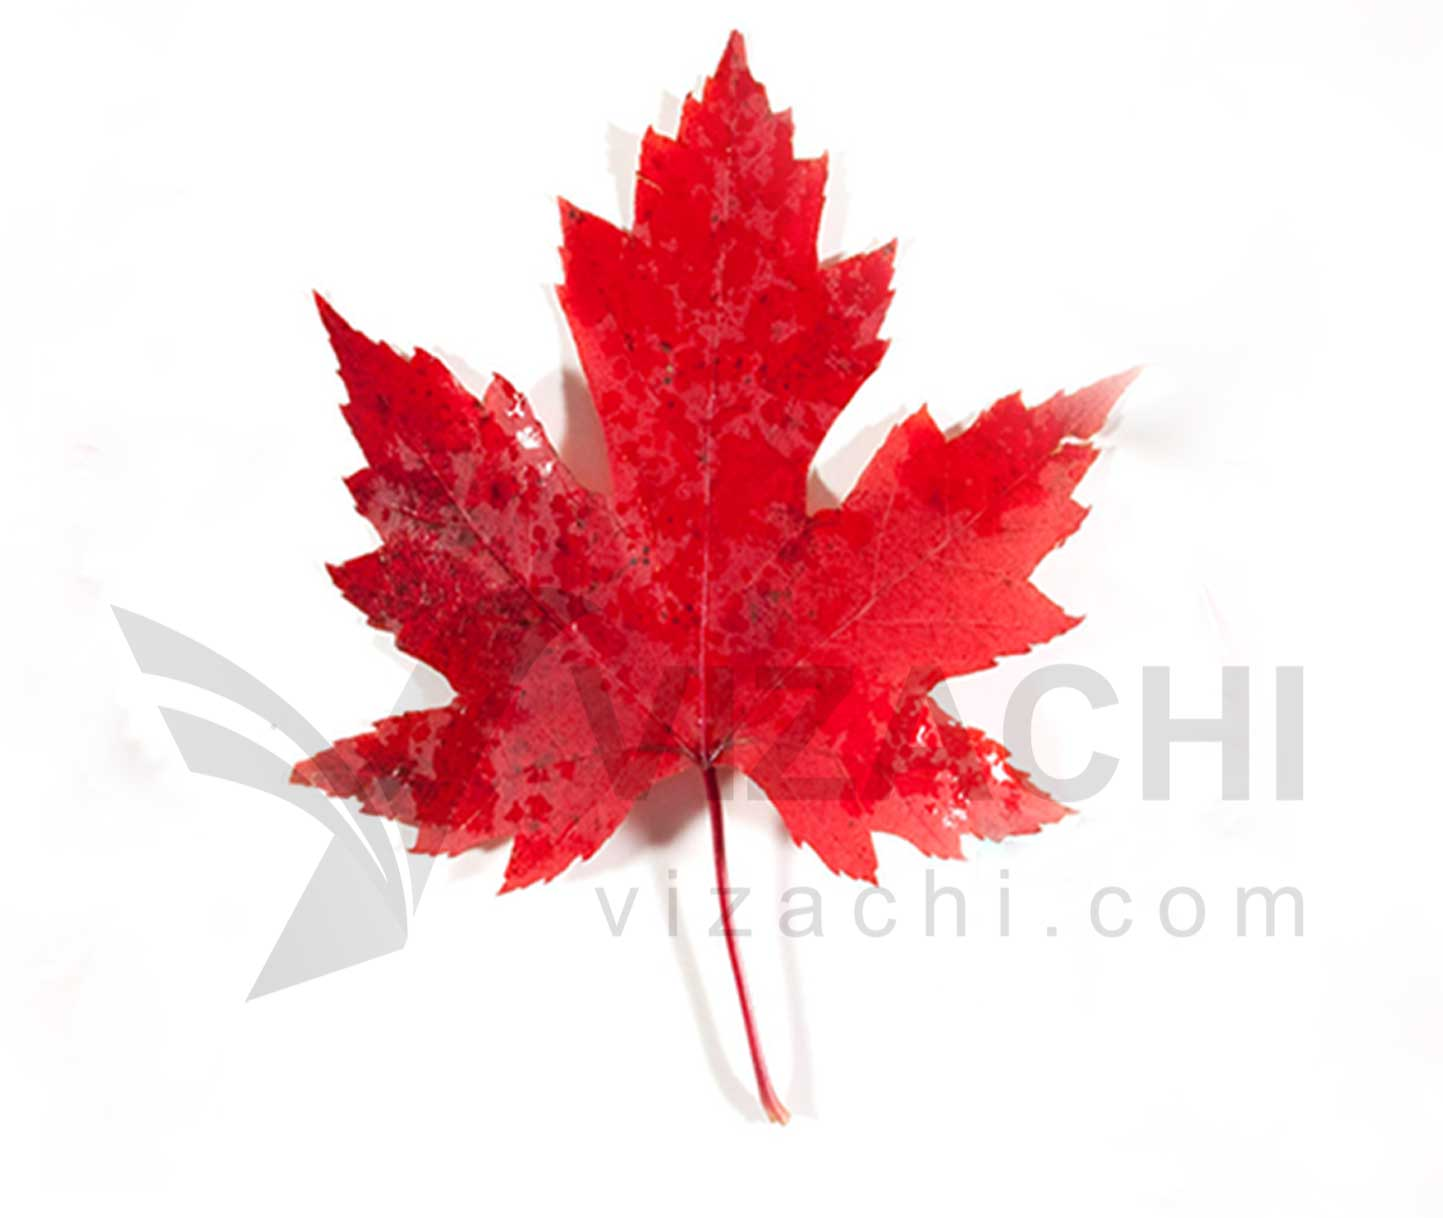 مهاجرت-به-کانادا-ویزای-کانادا-اقامت-کانادا-ویزای-تحصیلی-کانادا-اکسپرس-اینتری-ویزا-کانادا-پناهندگی-کانادا-اقامت-دائم-کانادا-ویزاچی-1-1